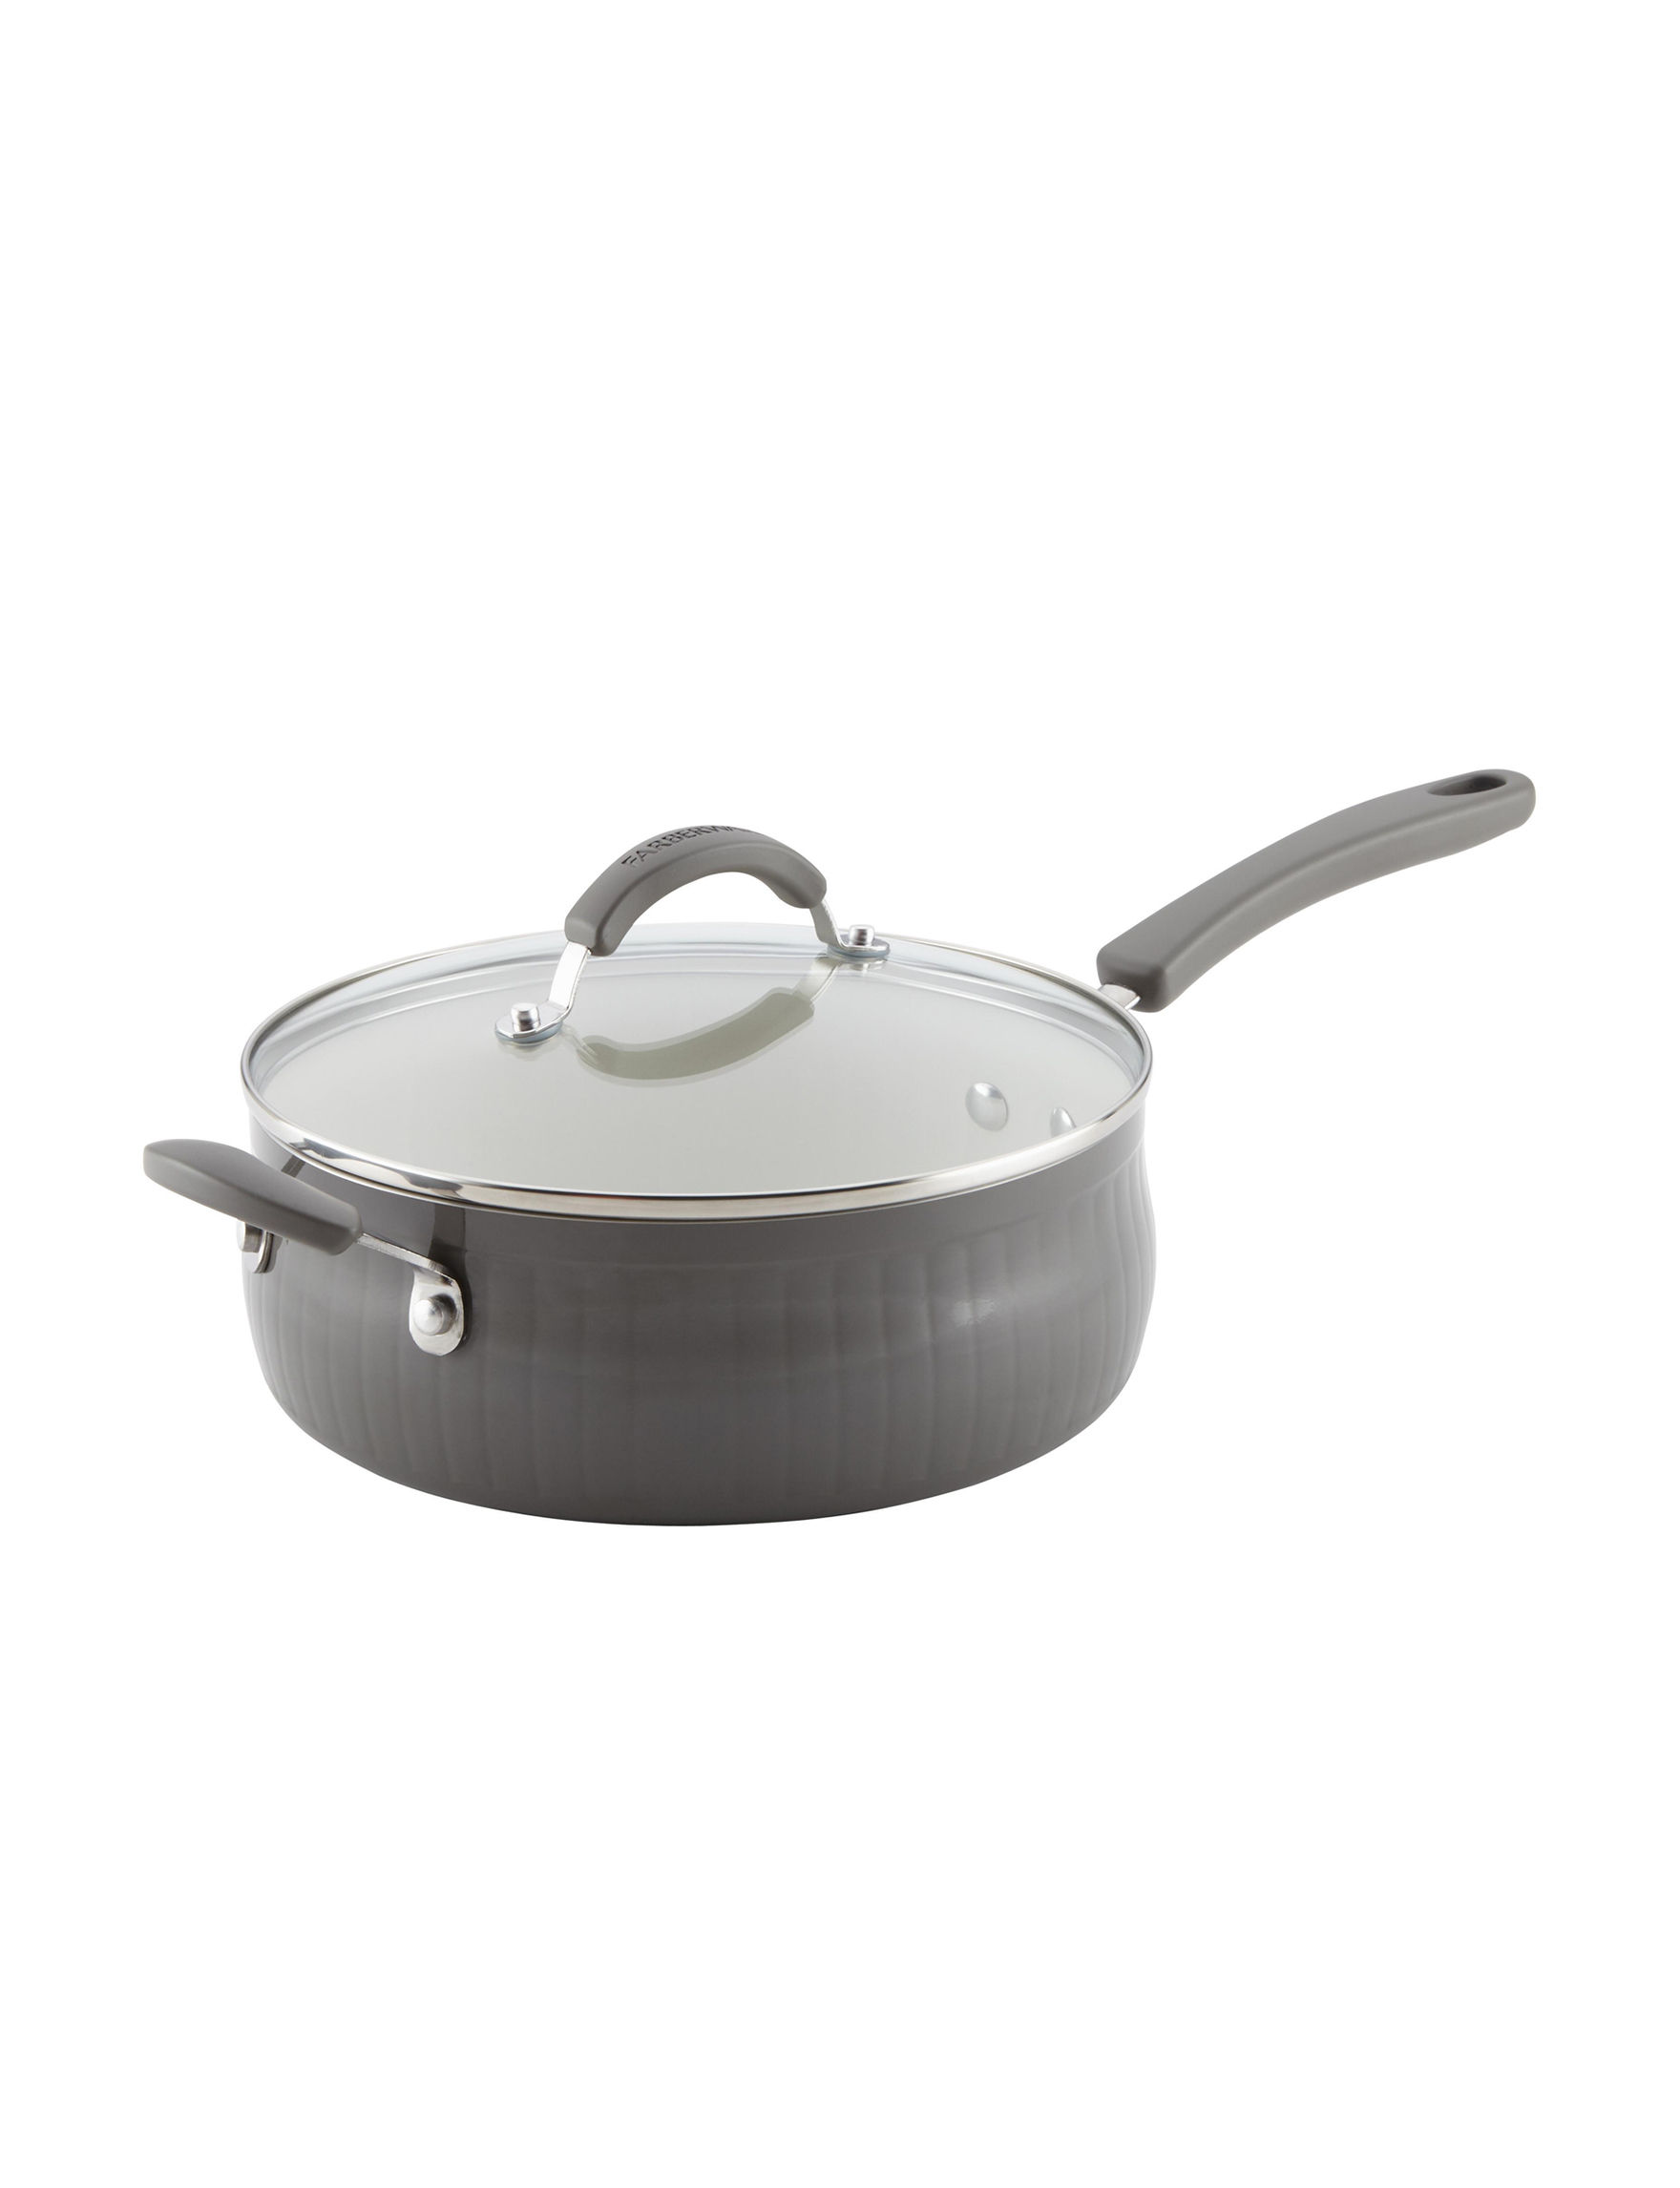 Farberware Grey Frying Pans & Skillets Cookware